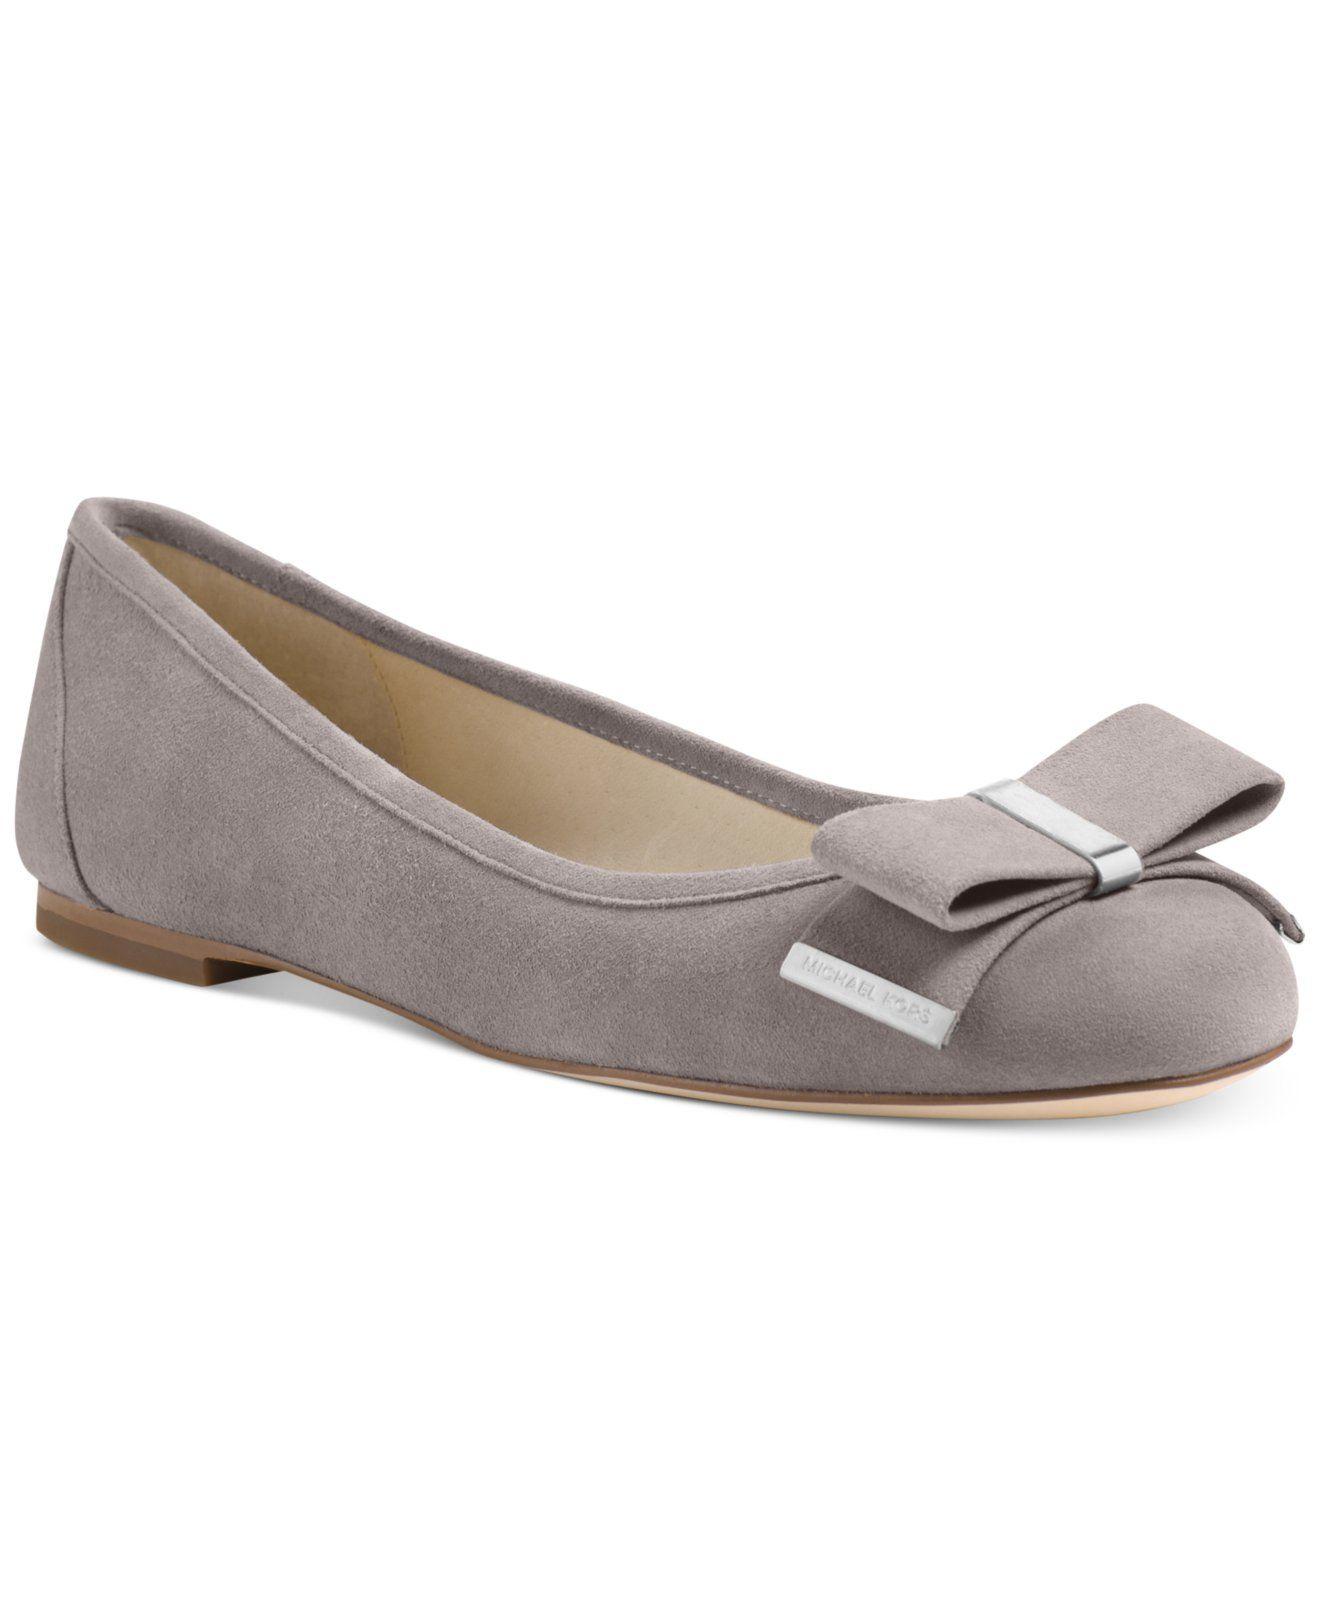 Michael Kors Kiera Ballet Flats - Shoes